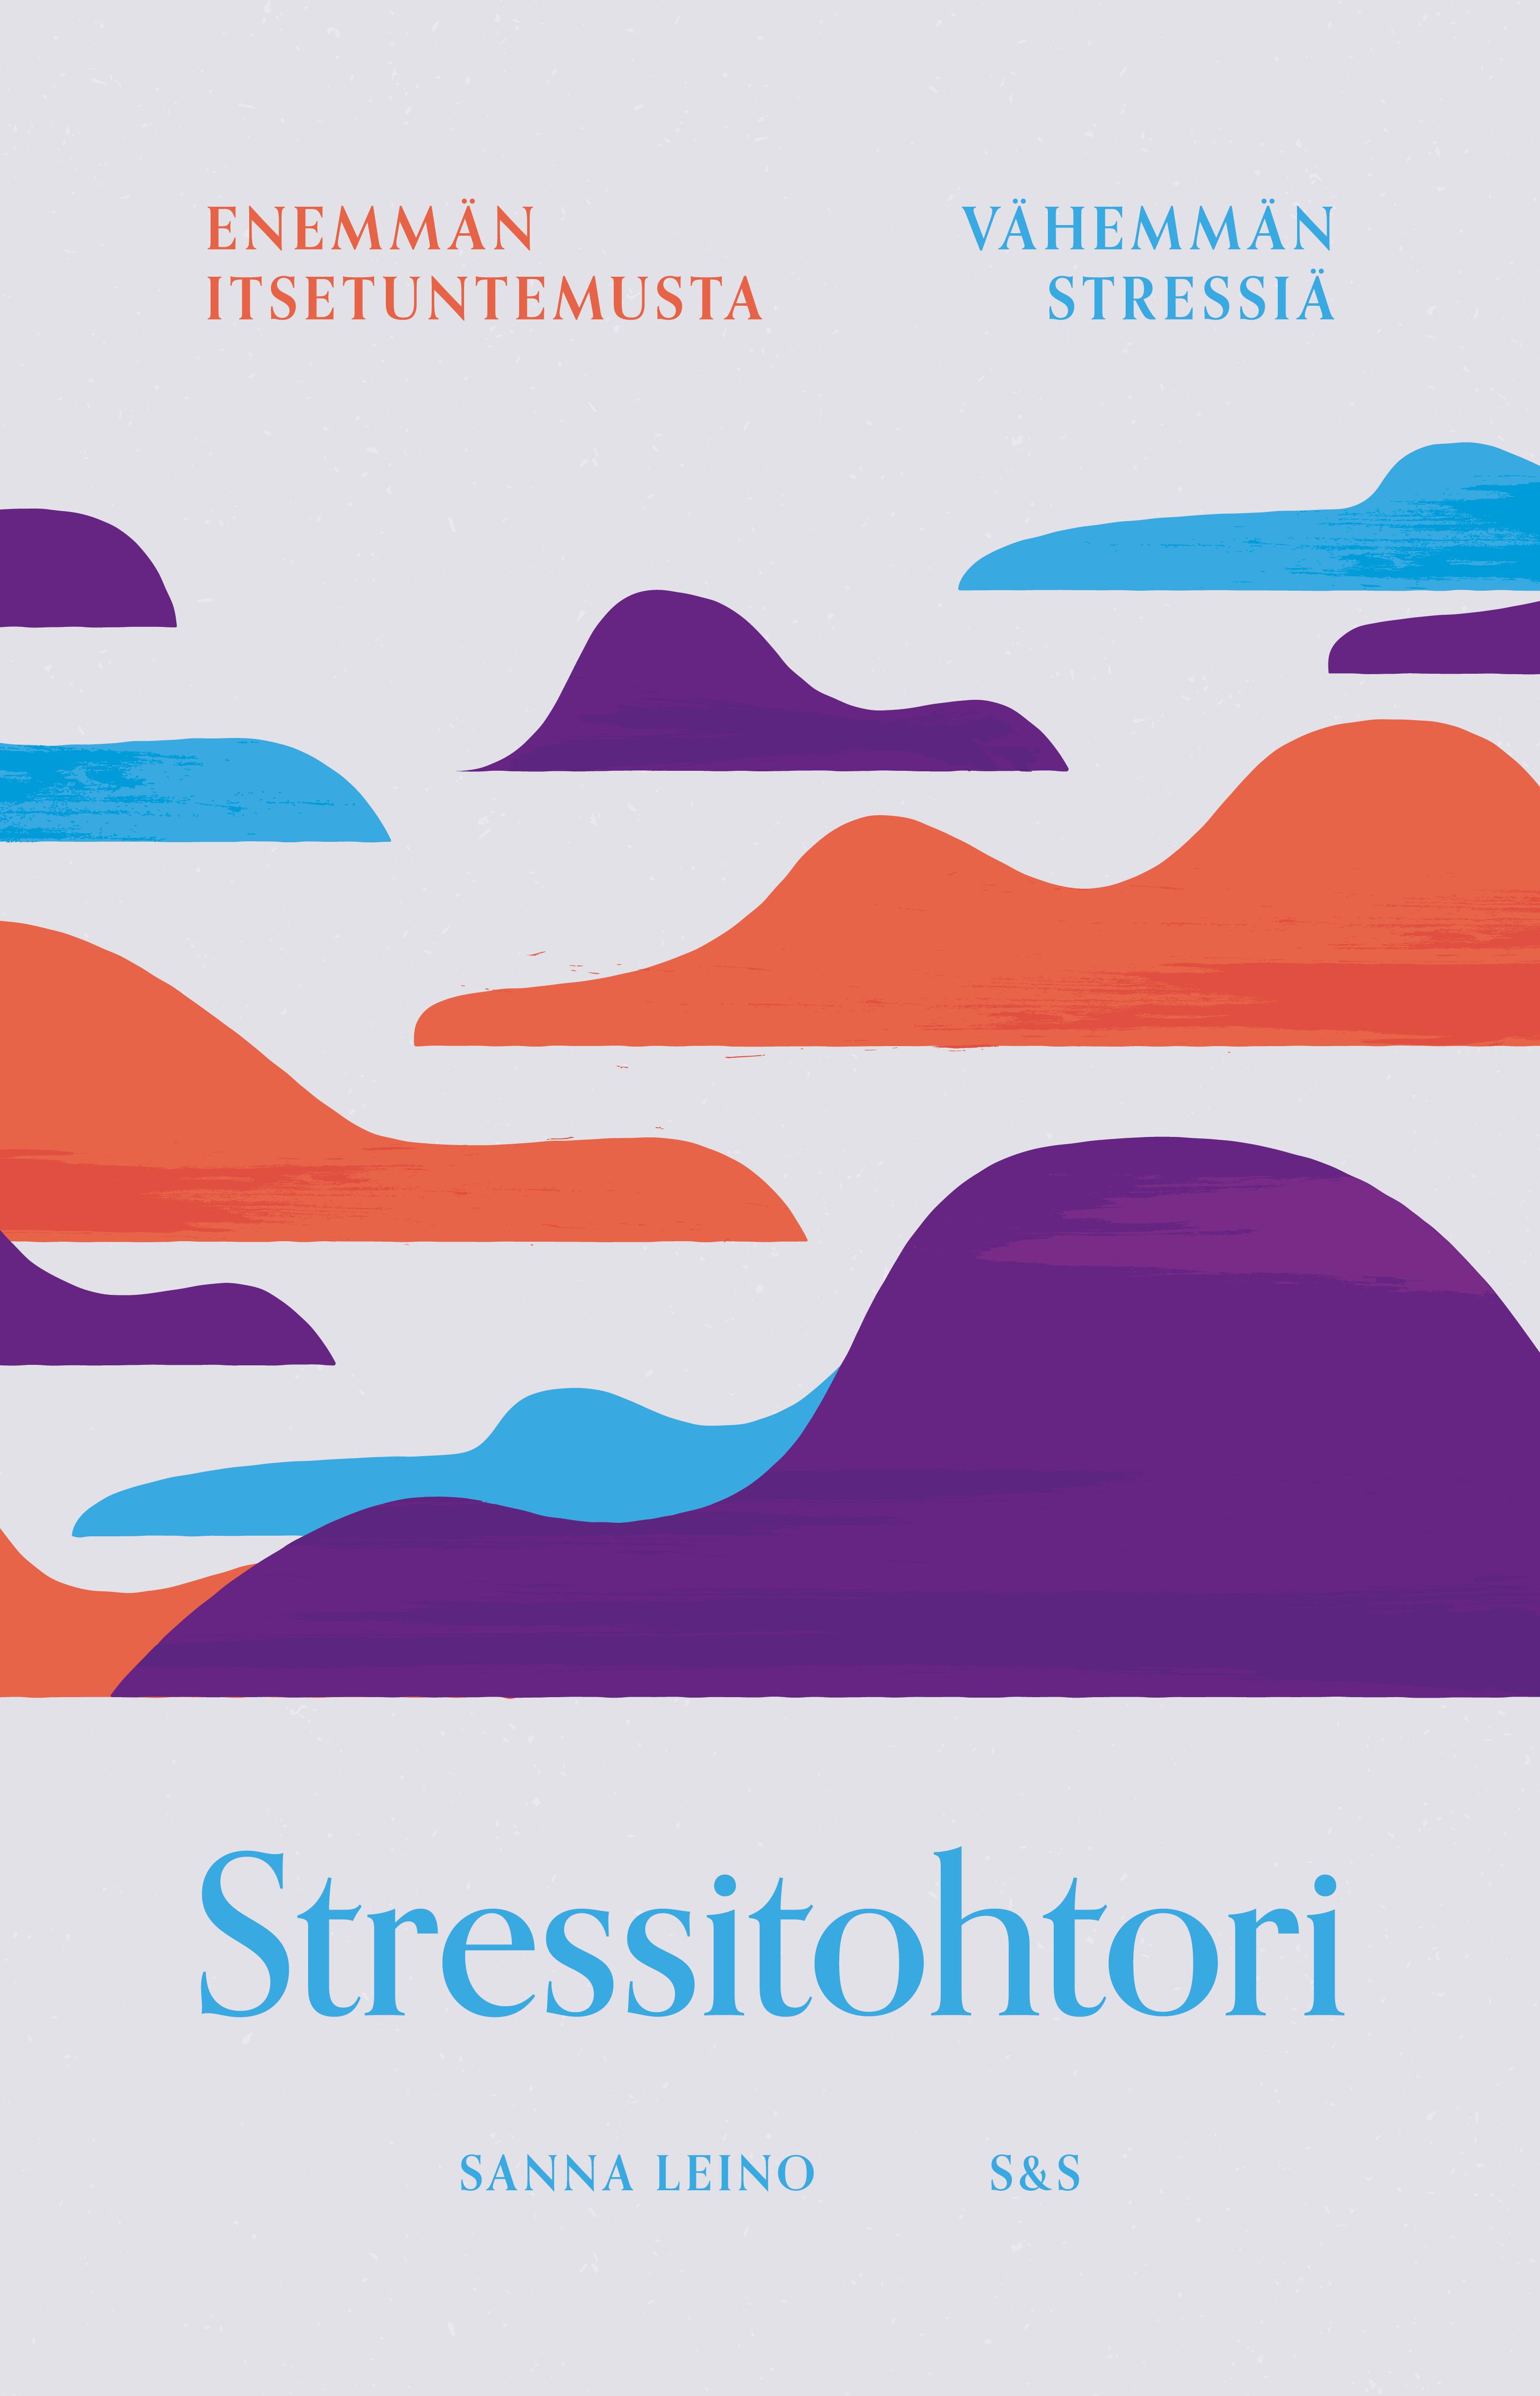 Stressitohtori